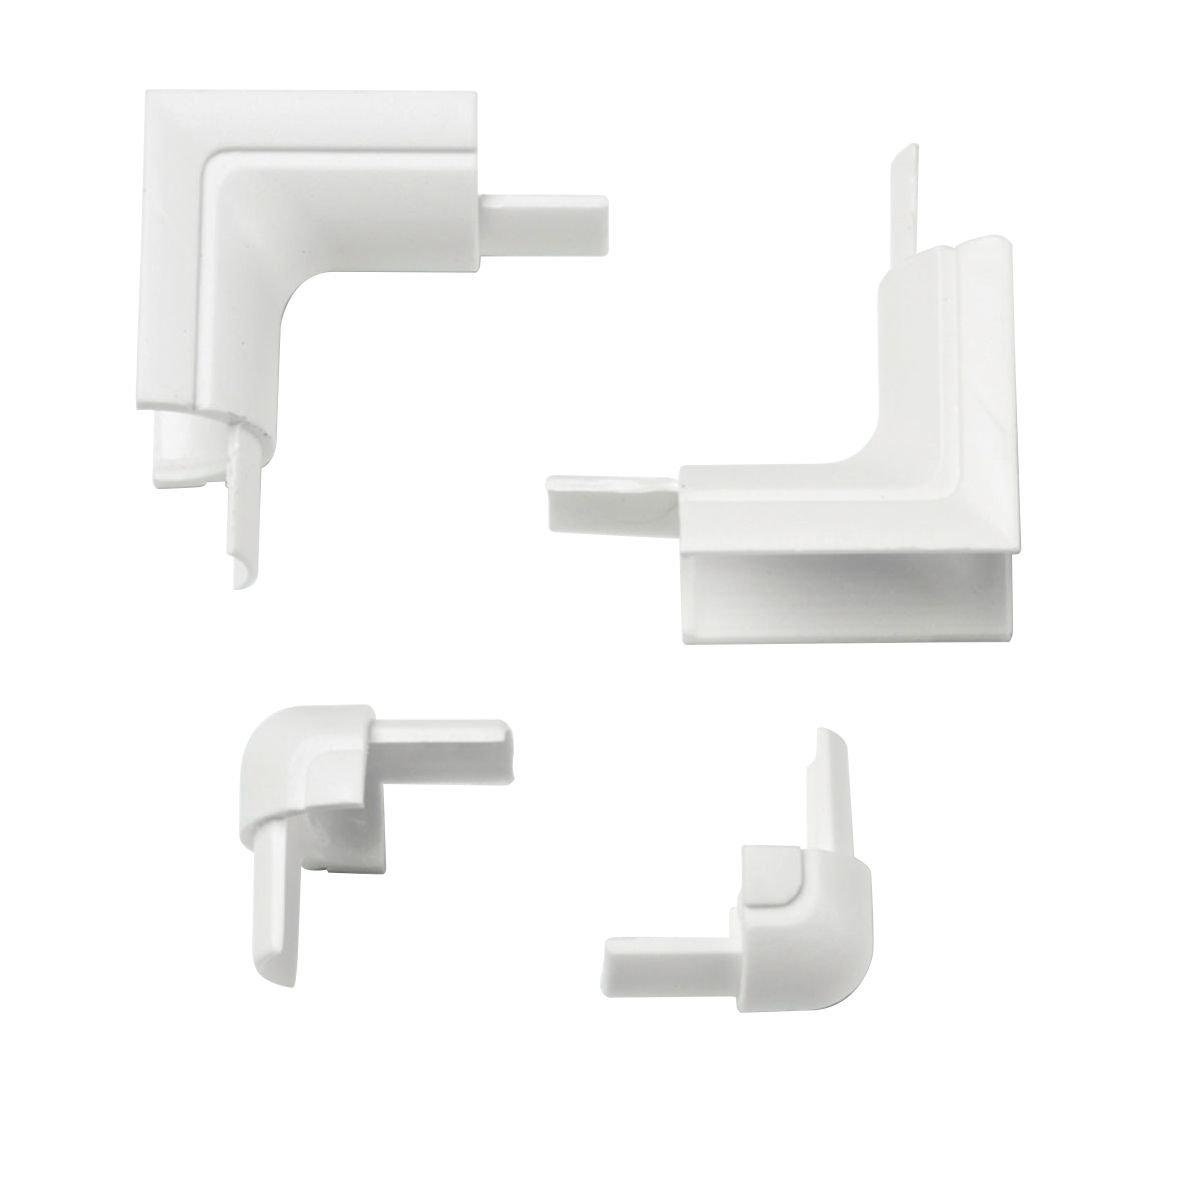 Smooth-Fit Internal & External Bend Pack 16 x 8mm White 4Pcs D-Line